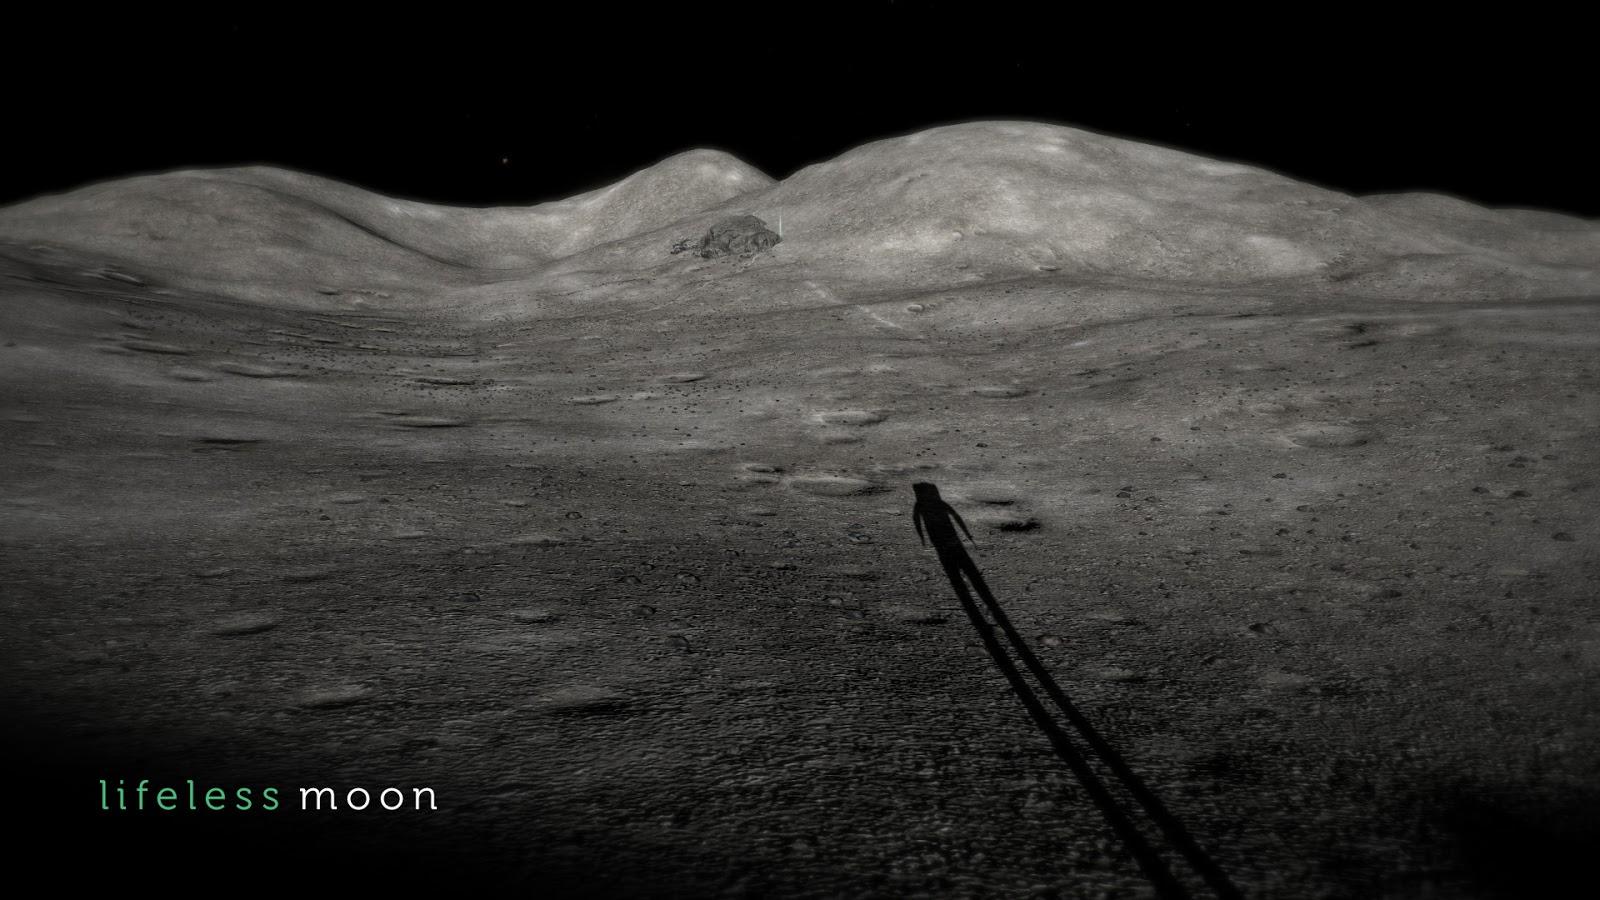 Lifeless Moon